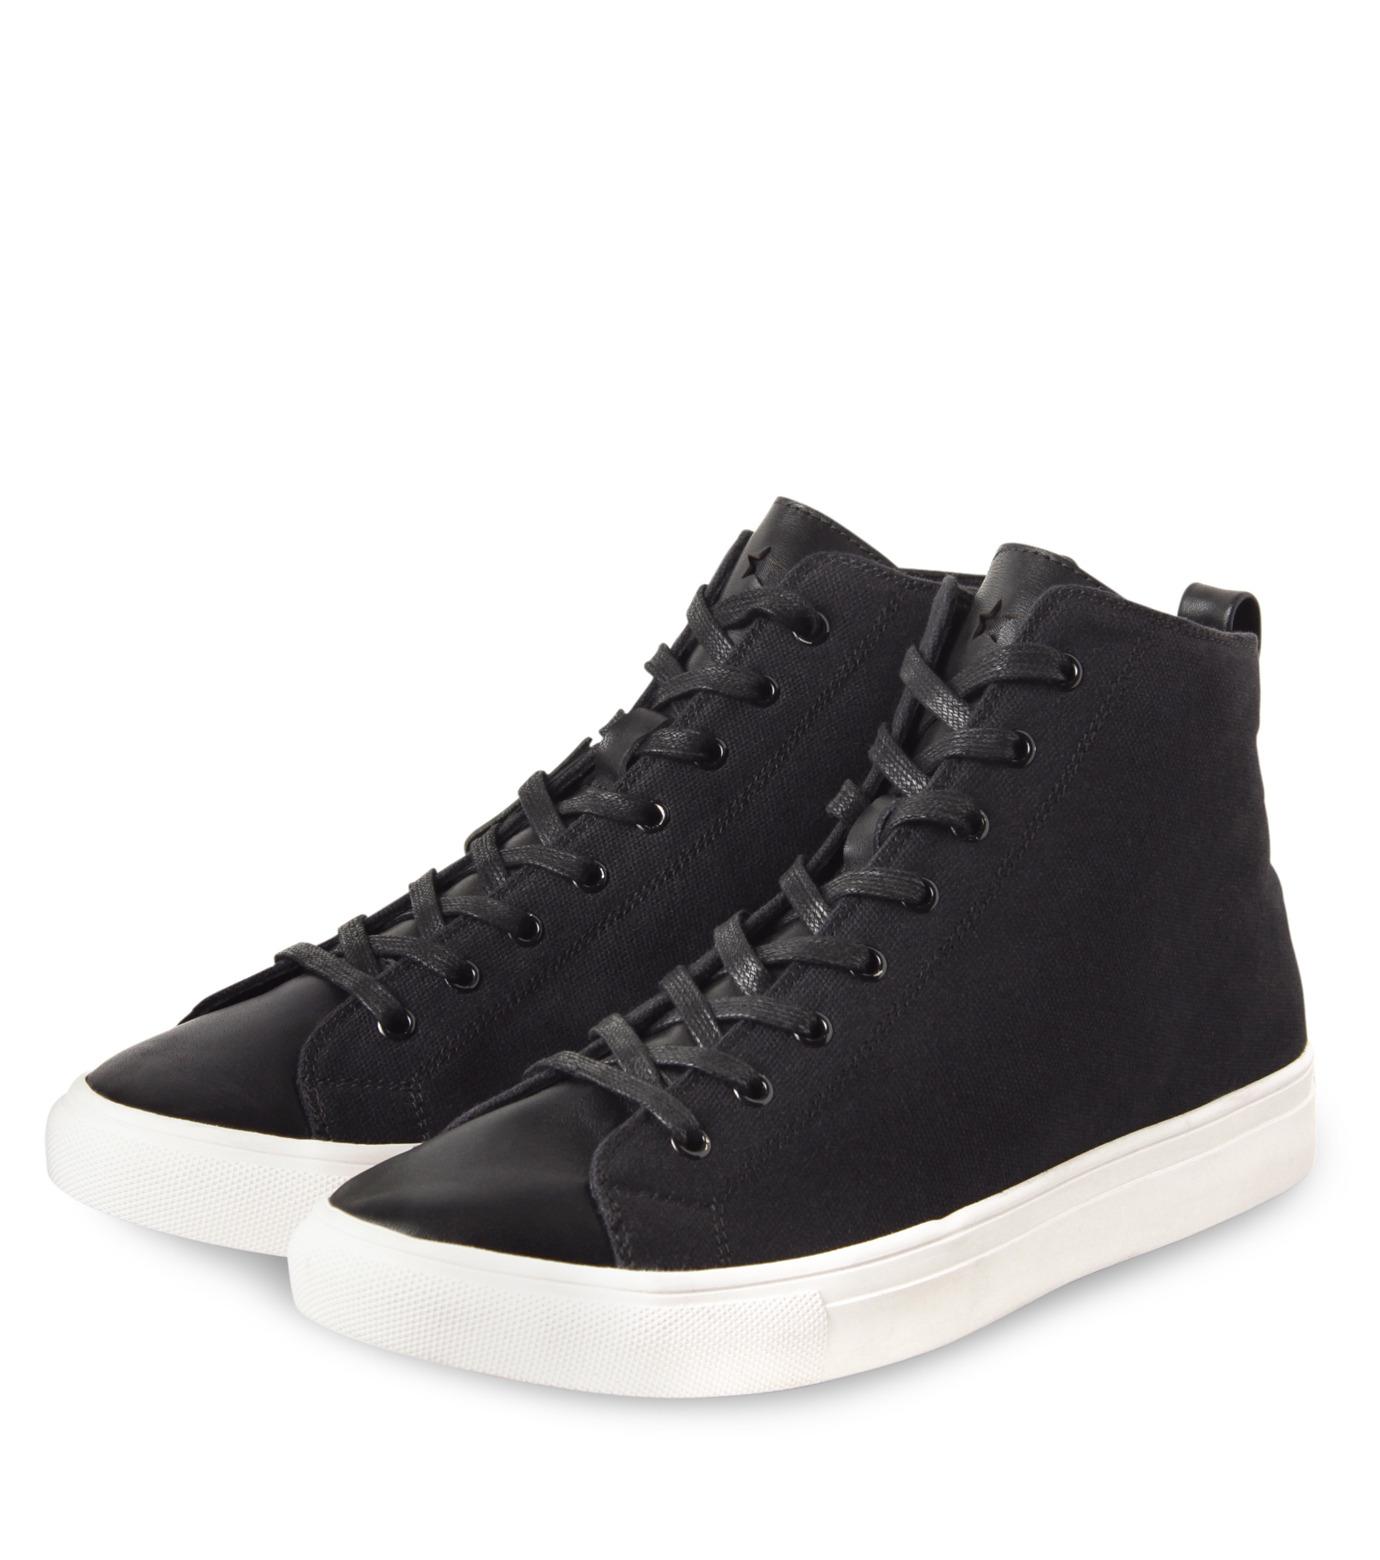 HL HEDDIE LOVU(エイチエル・エディールーヴ)のHL Hi sneaker-BLACK(スニーカー/sneaker)-16A90006-13 拡大詳細画像4